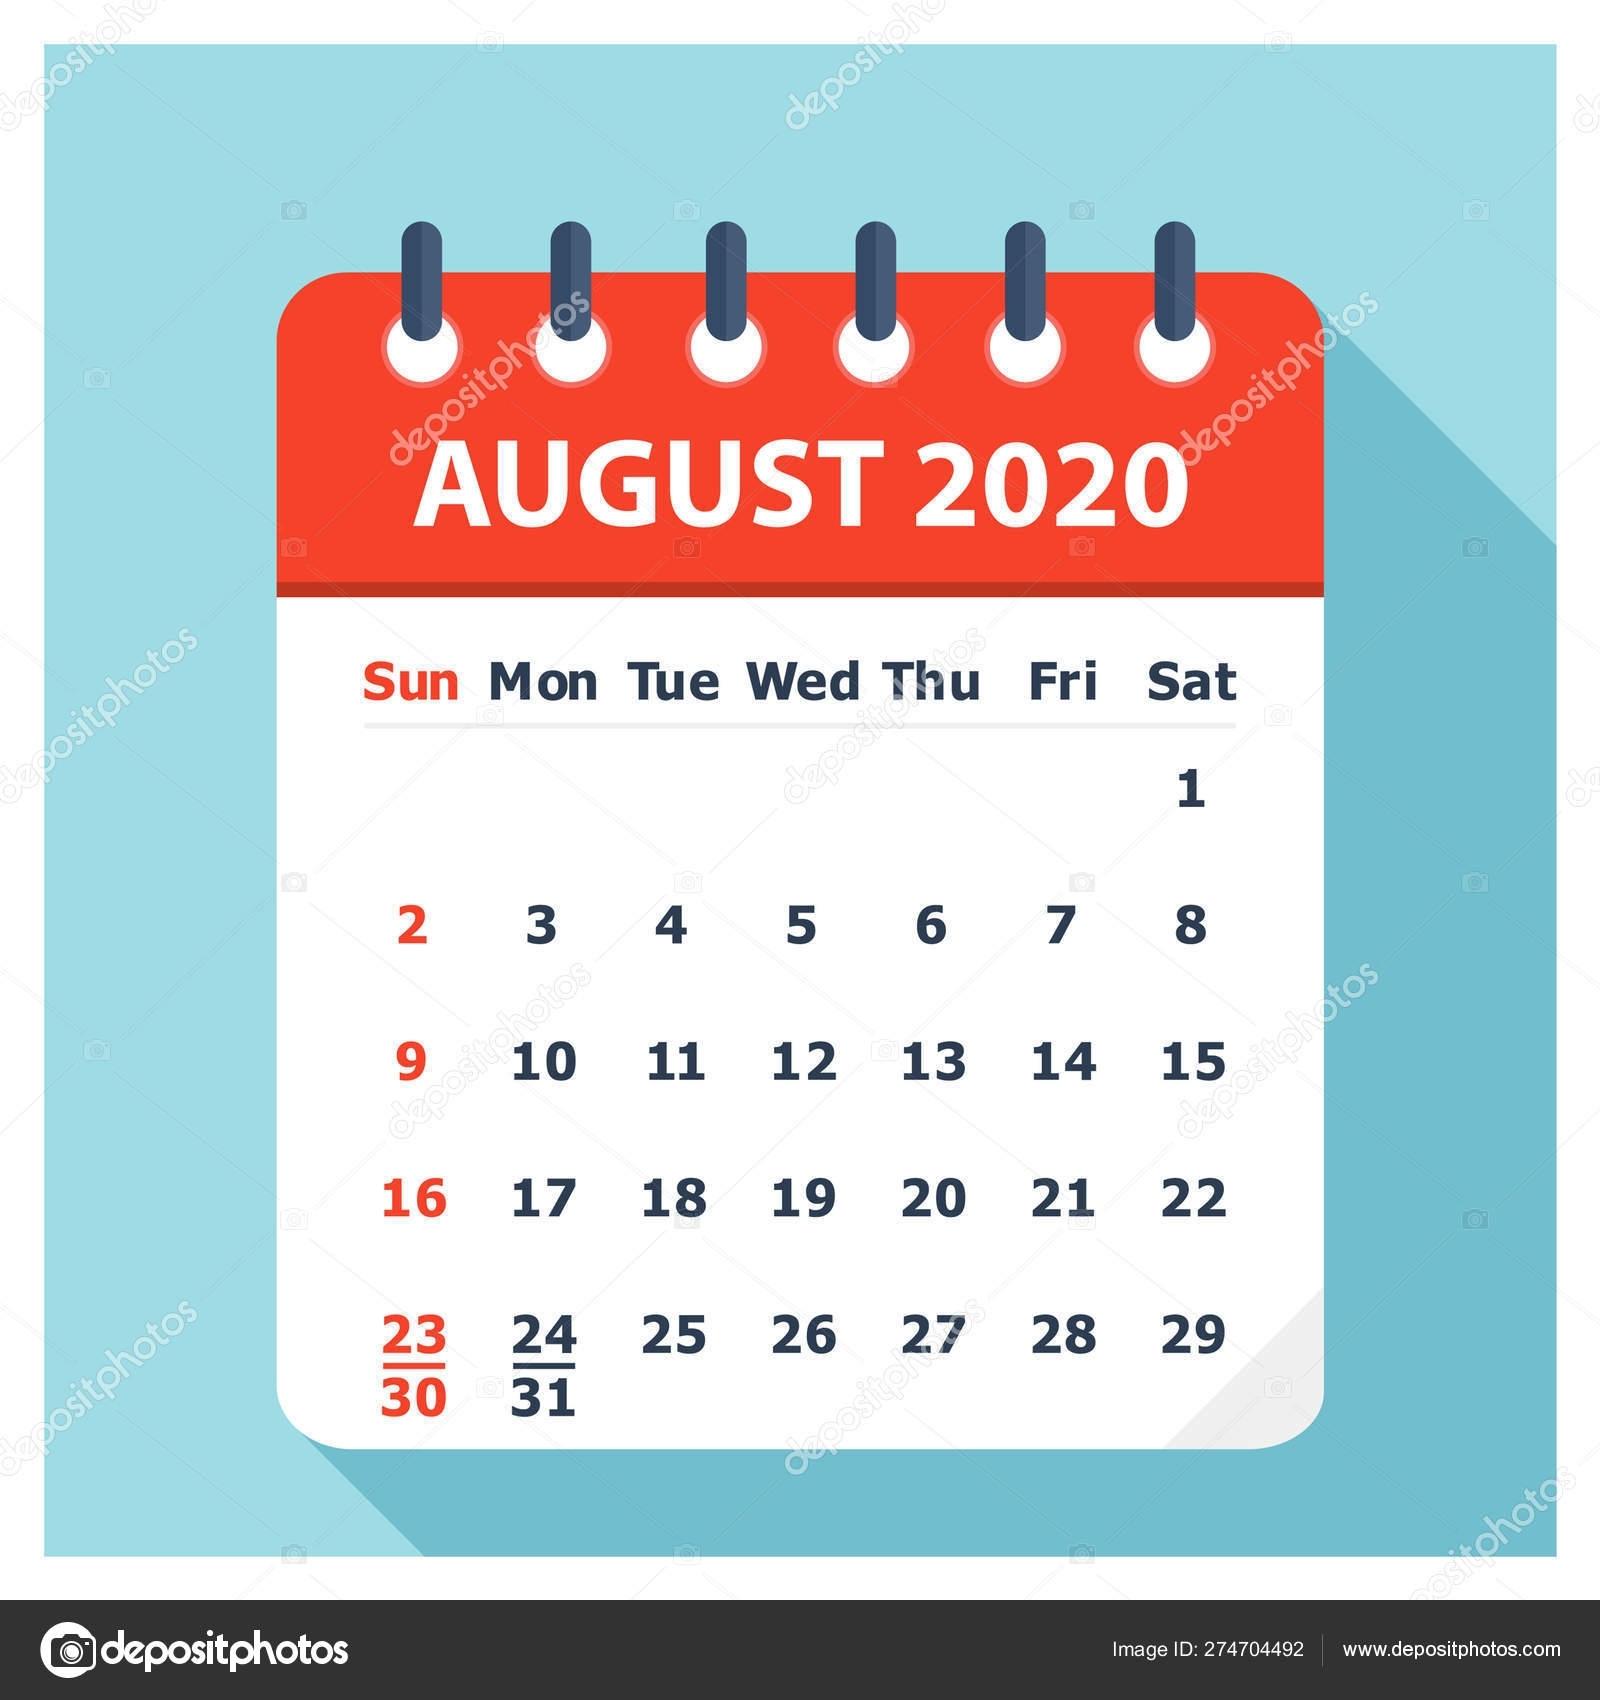 August 2020 - Calendar Icon - Calendar Design Template